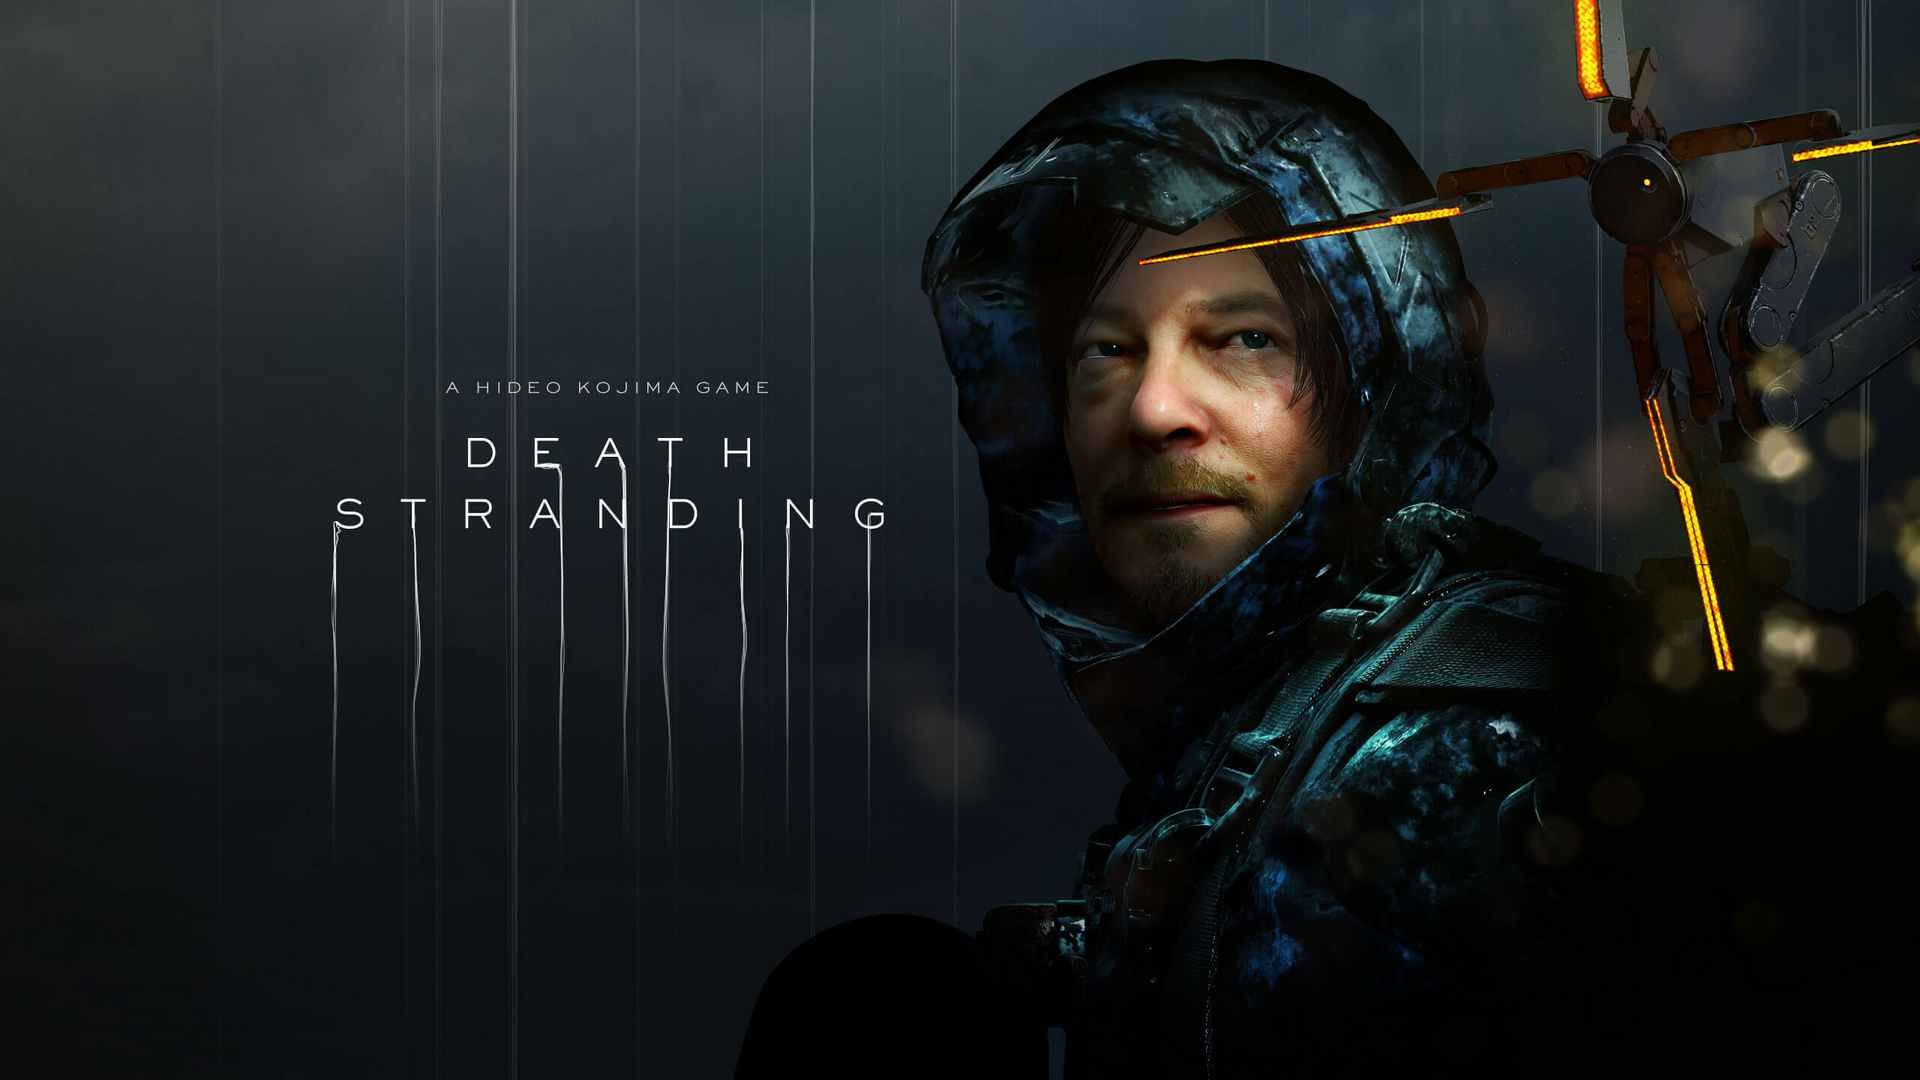 death stranding ديث ستراندنج